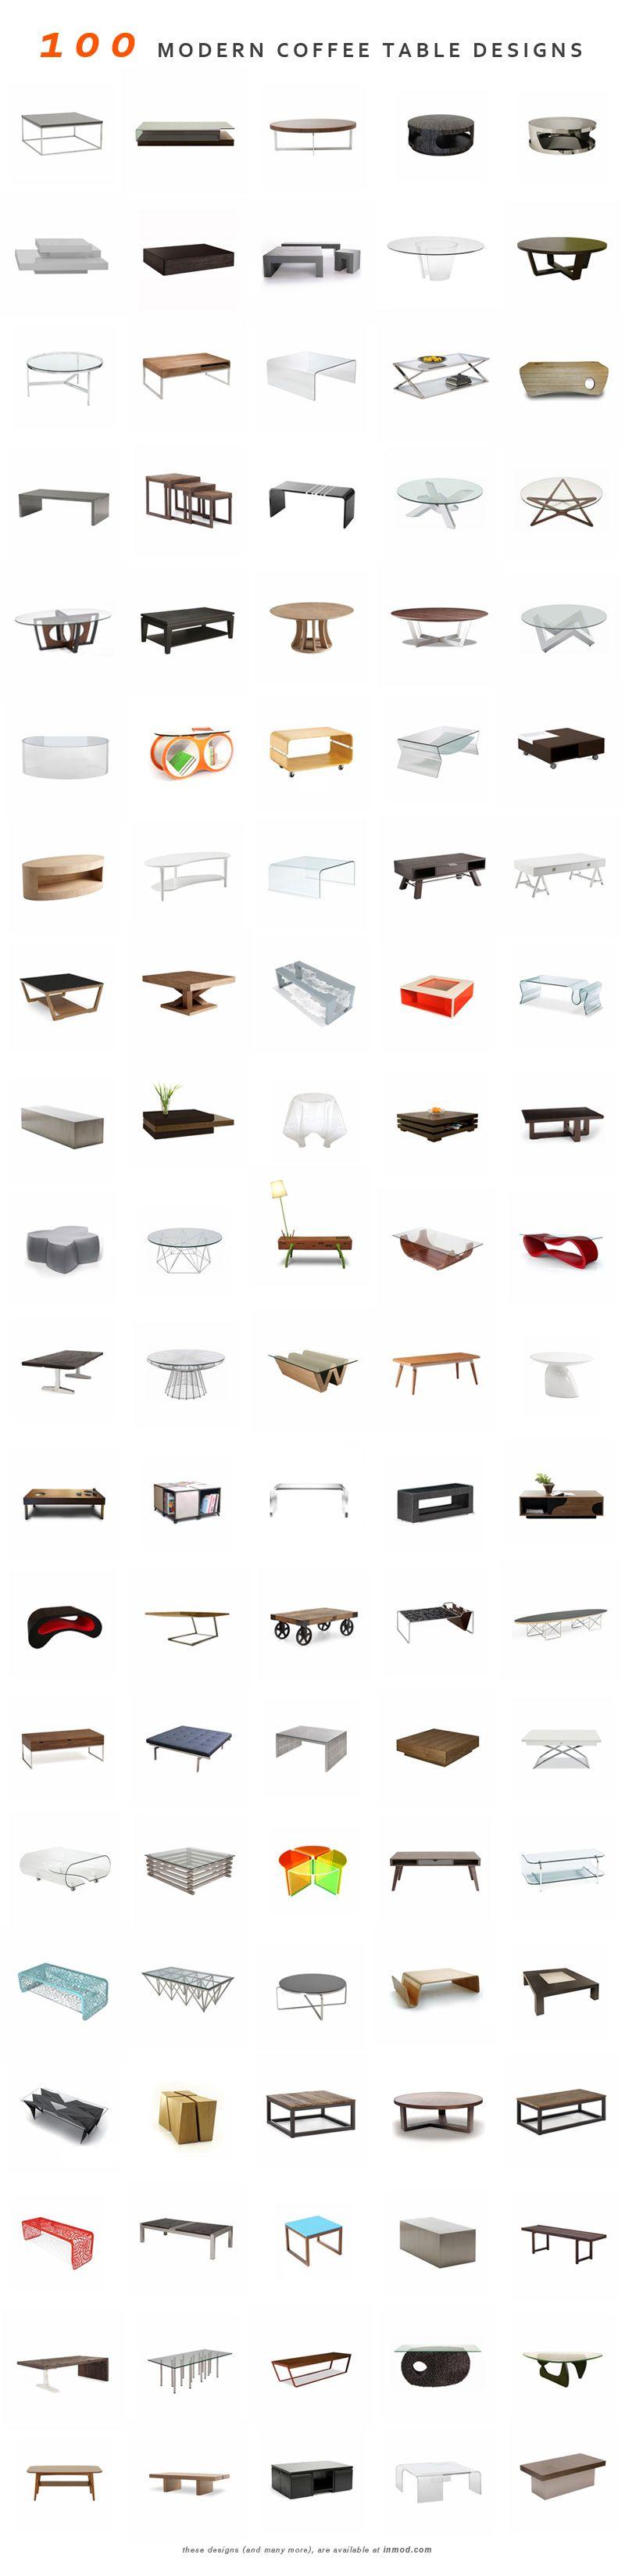 Modern Coffee Tables Coffee Table Plans Modern Coffee Tables Coffee Table Design [ 3295 x 800 Pixel ]